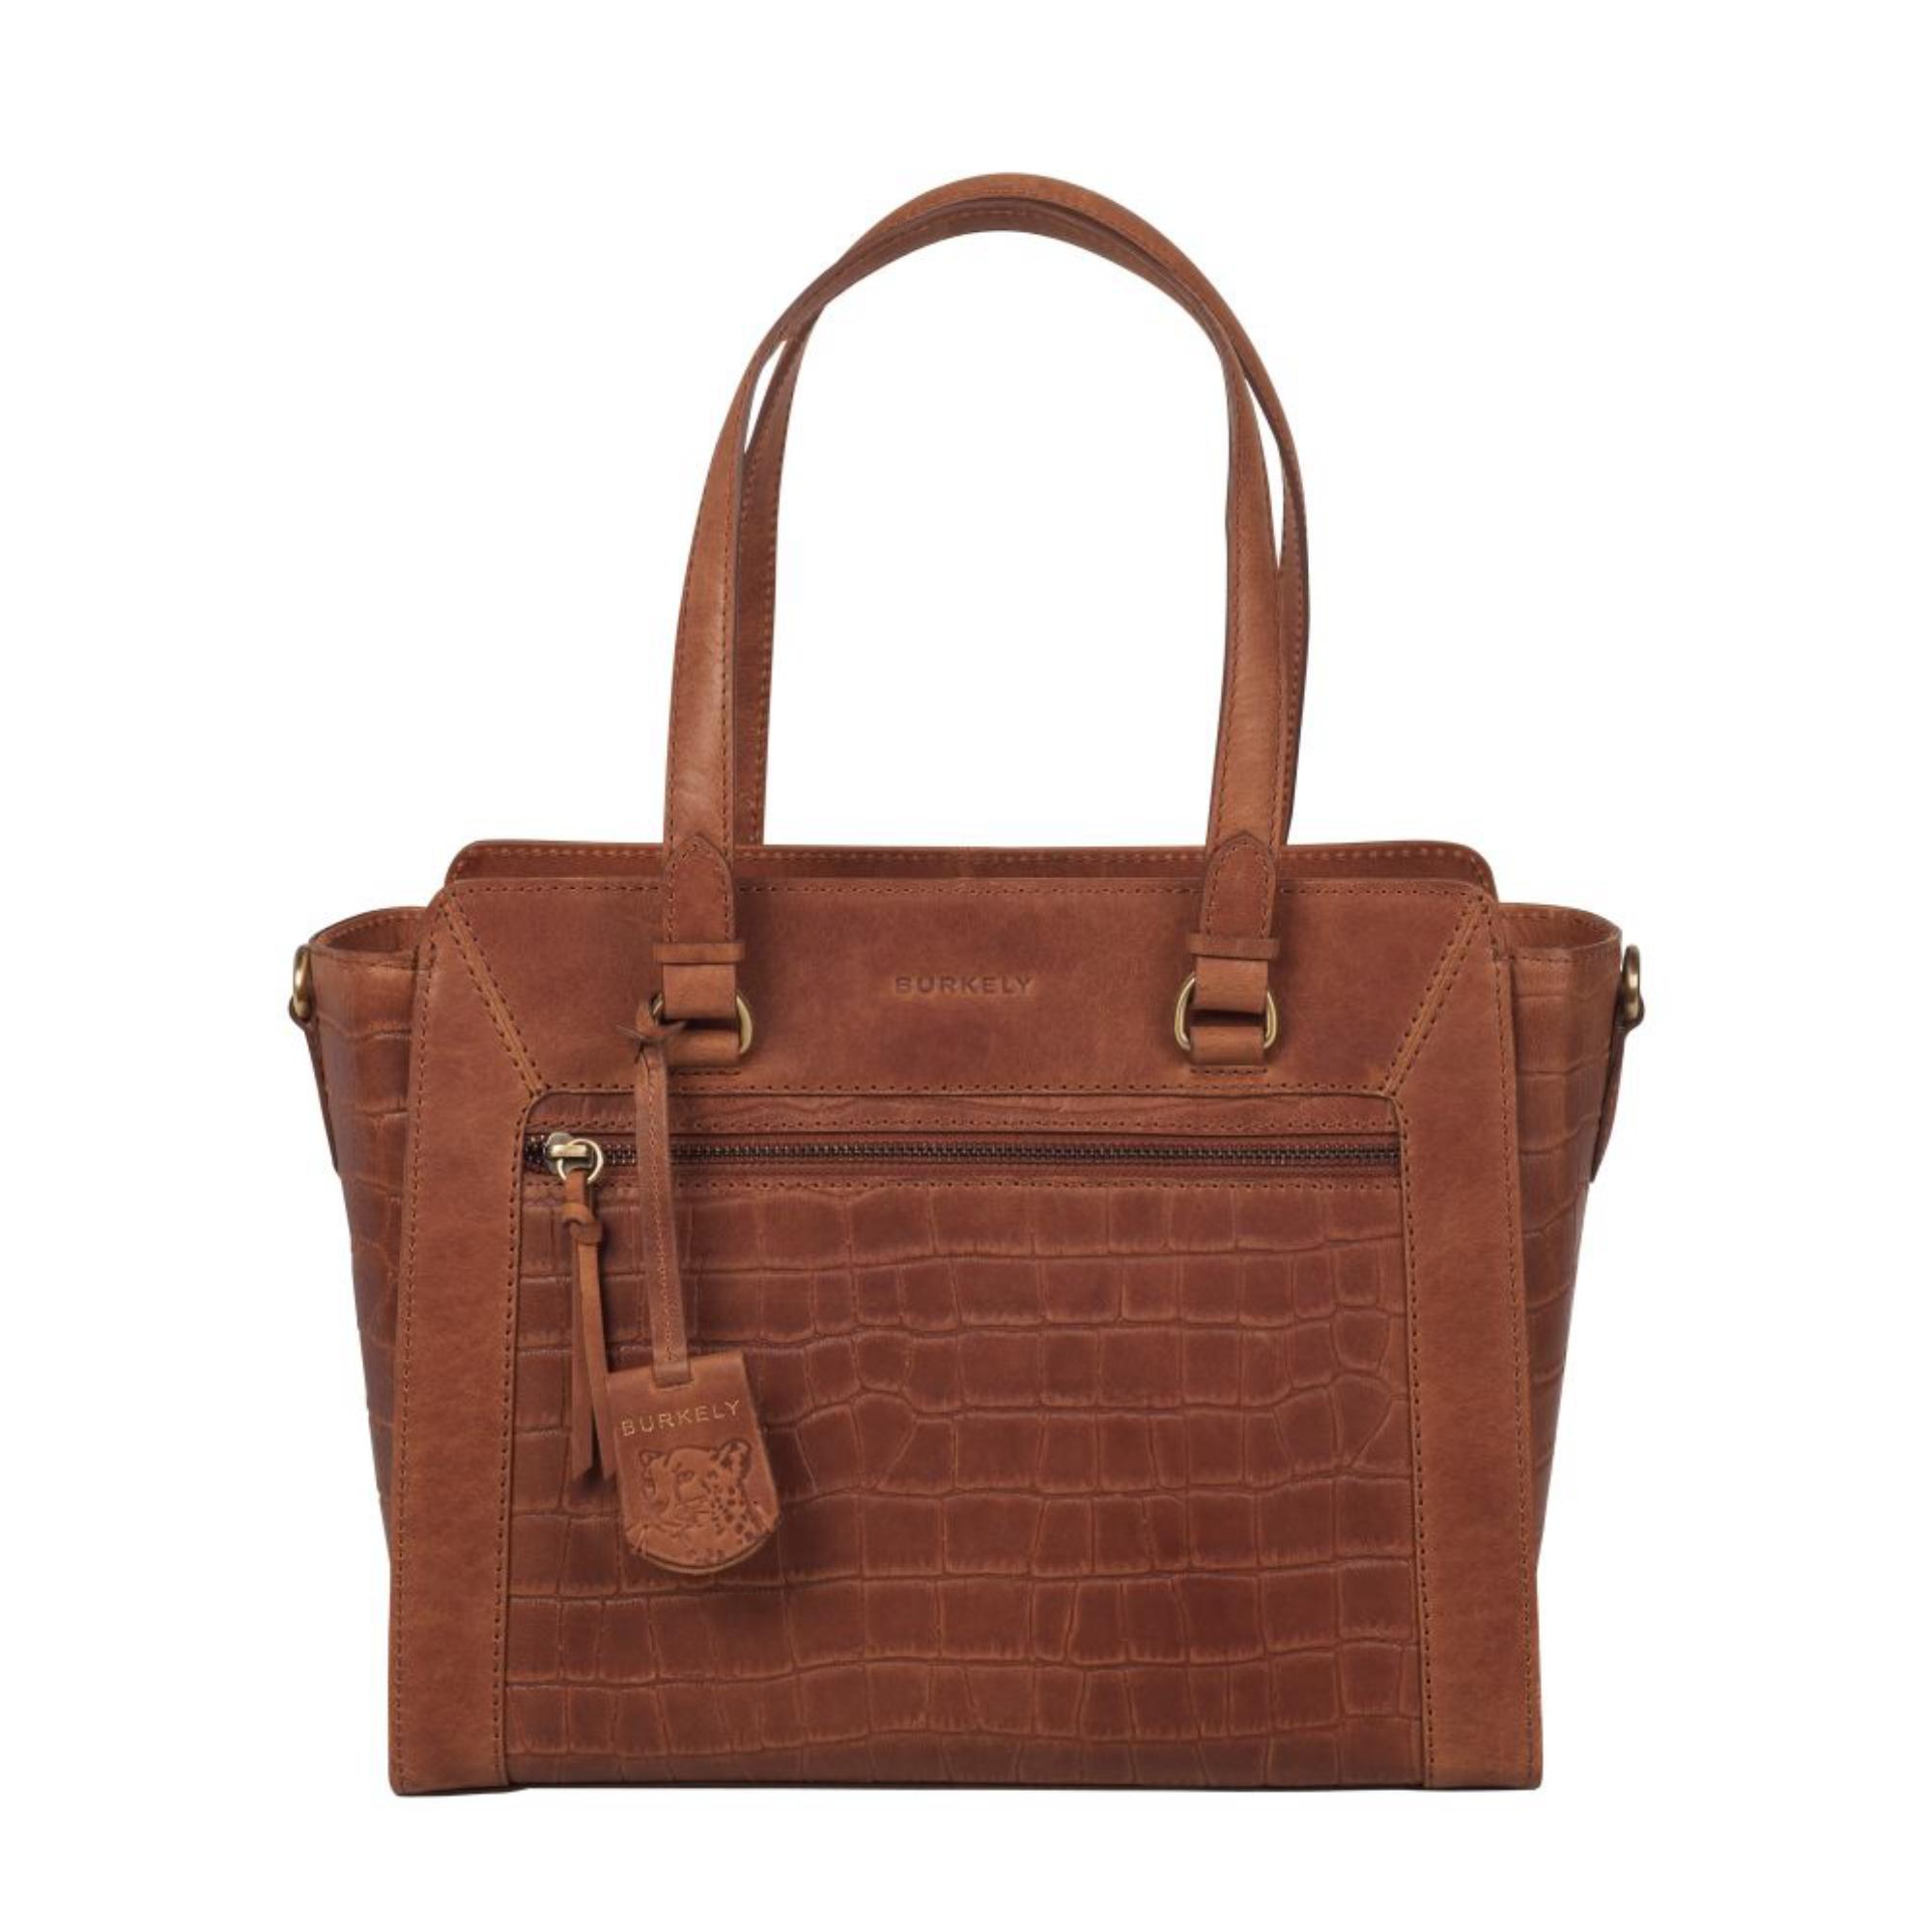 Burkely 1000123 Handbag S 29.24 Cognac